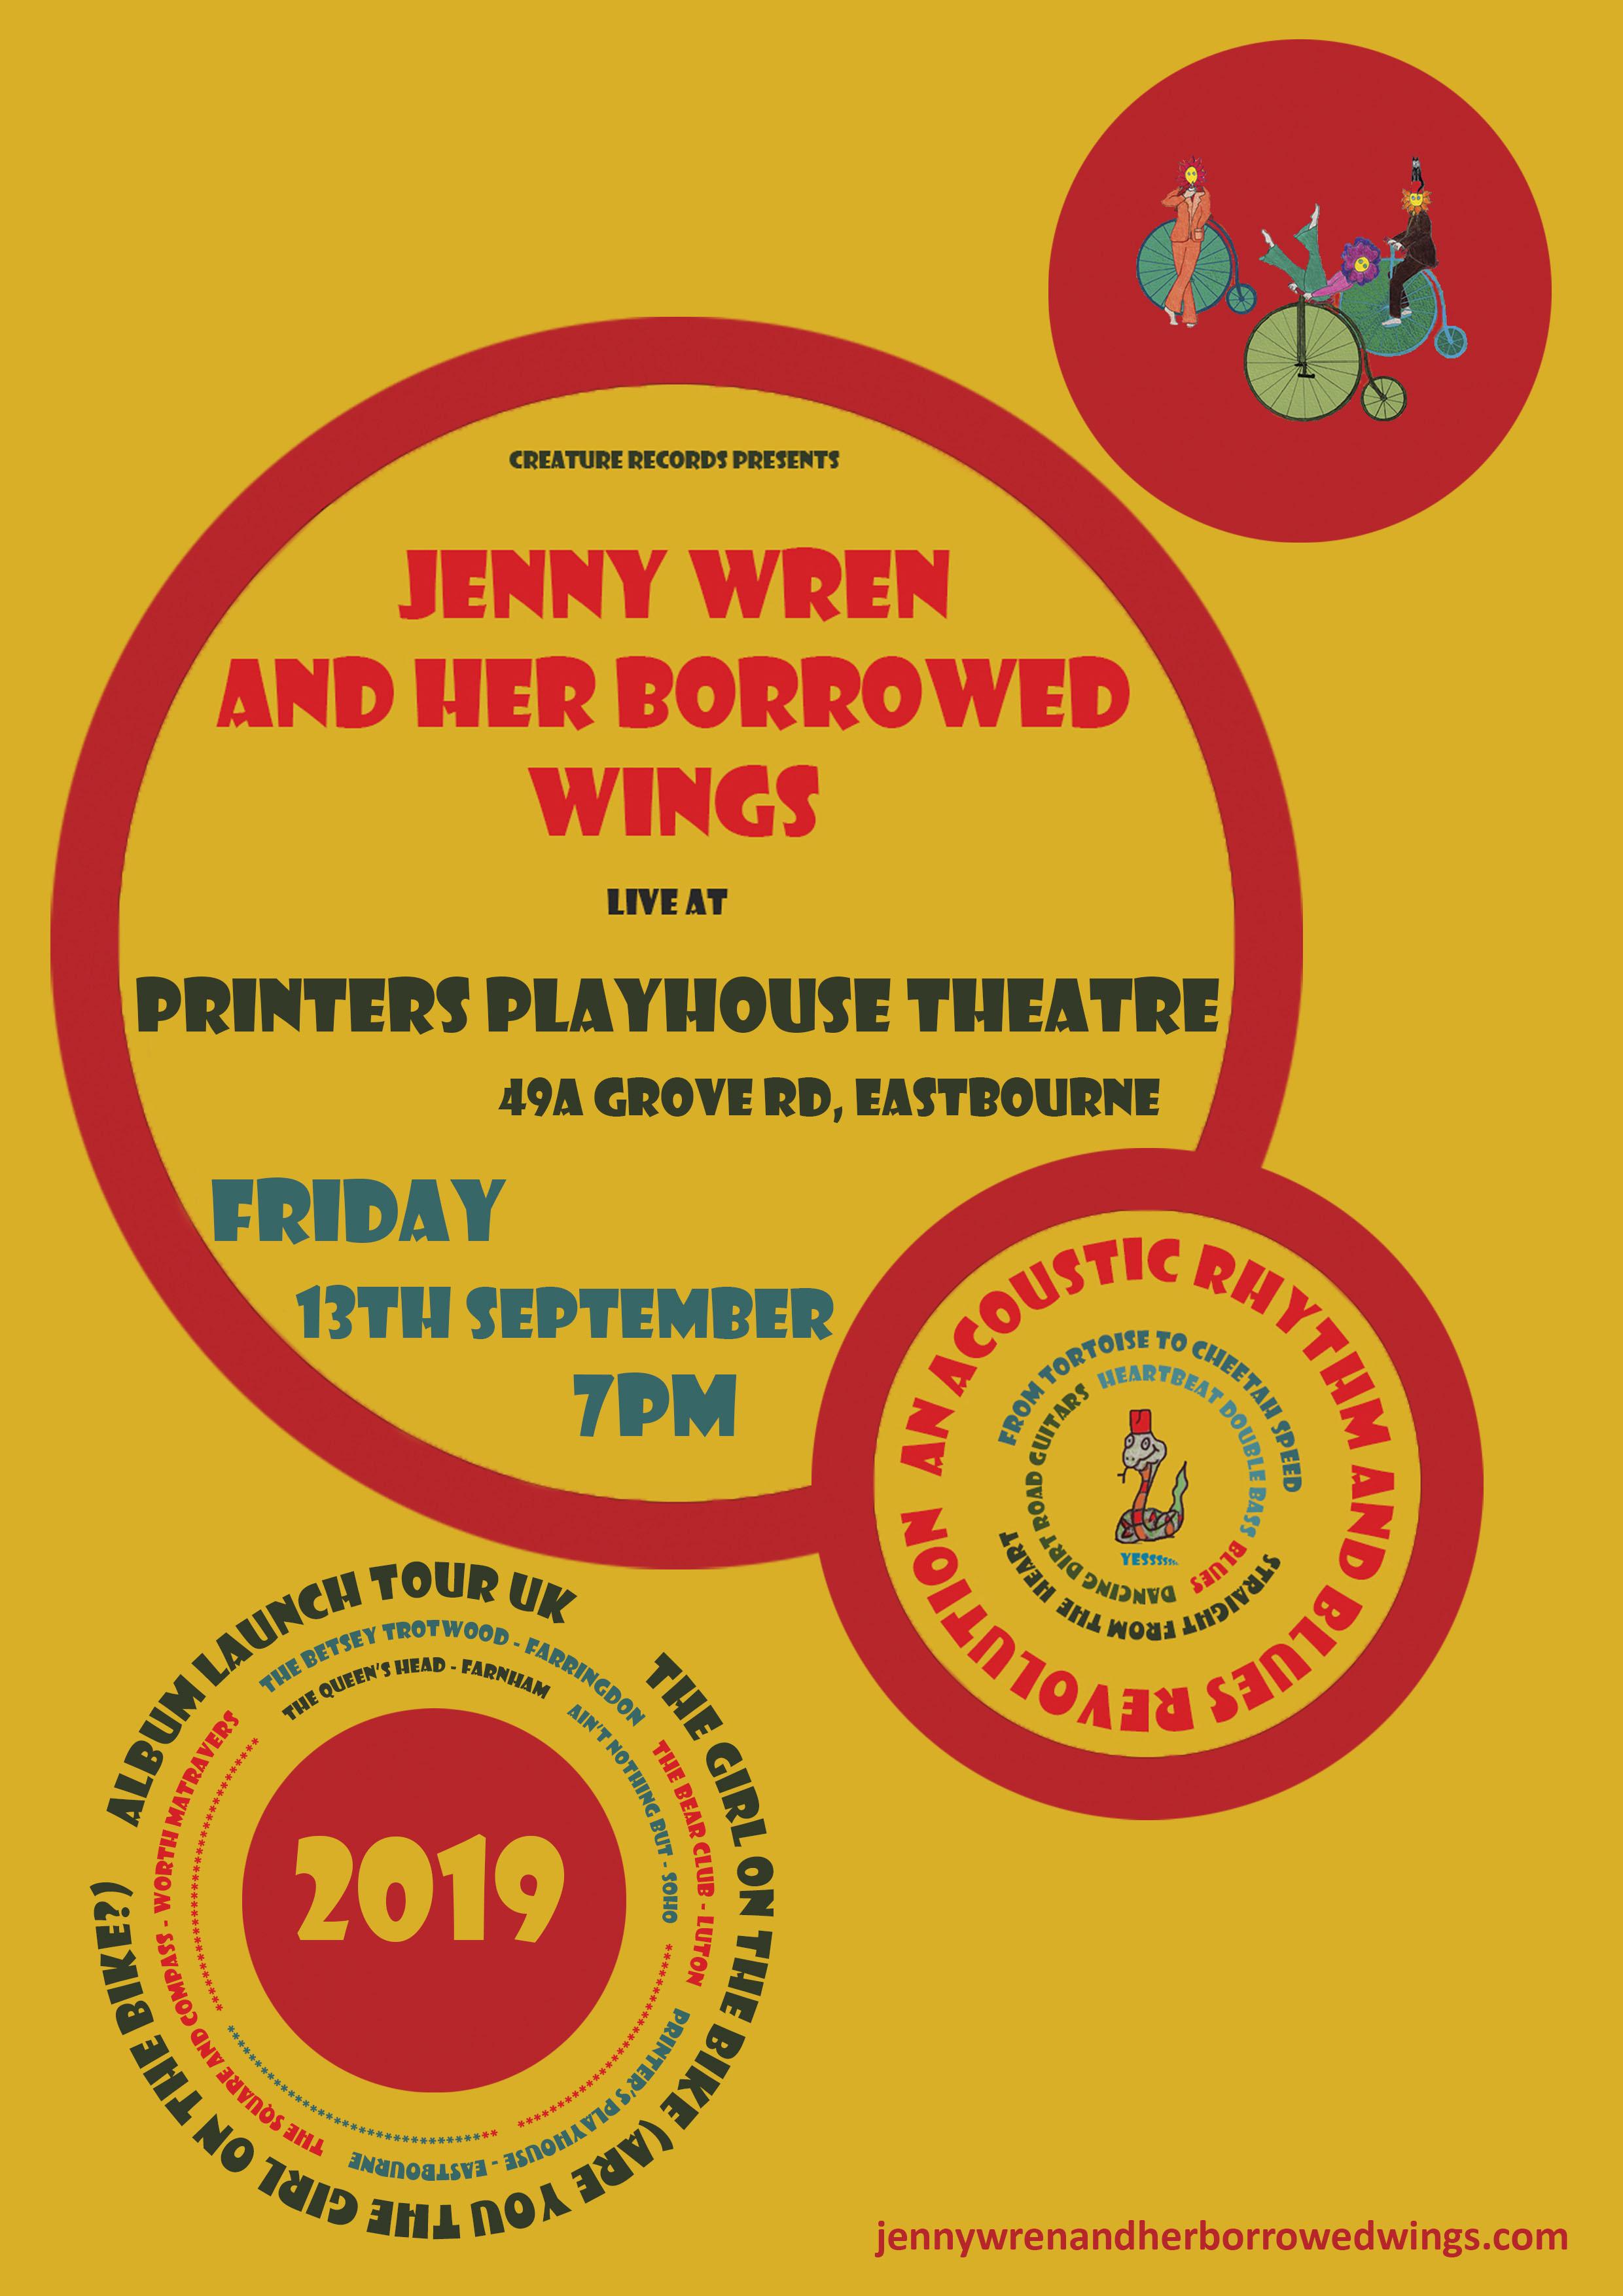 03.printers playhouse 13.09.19 - uk 2019 poster